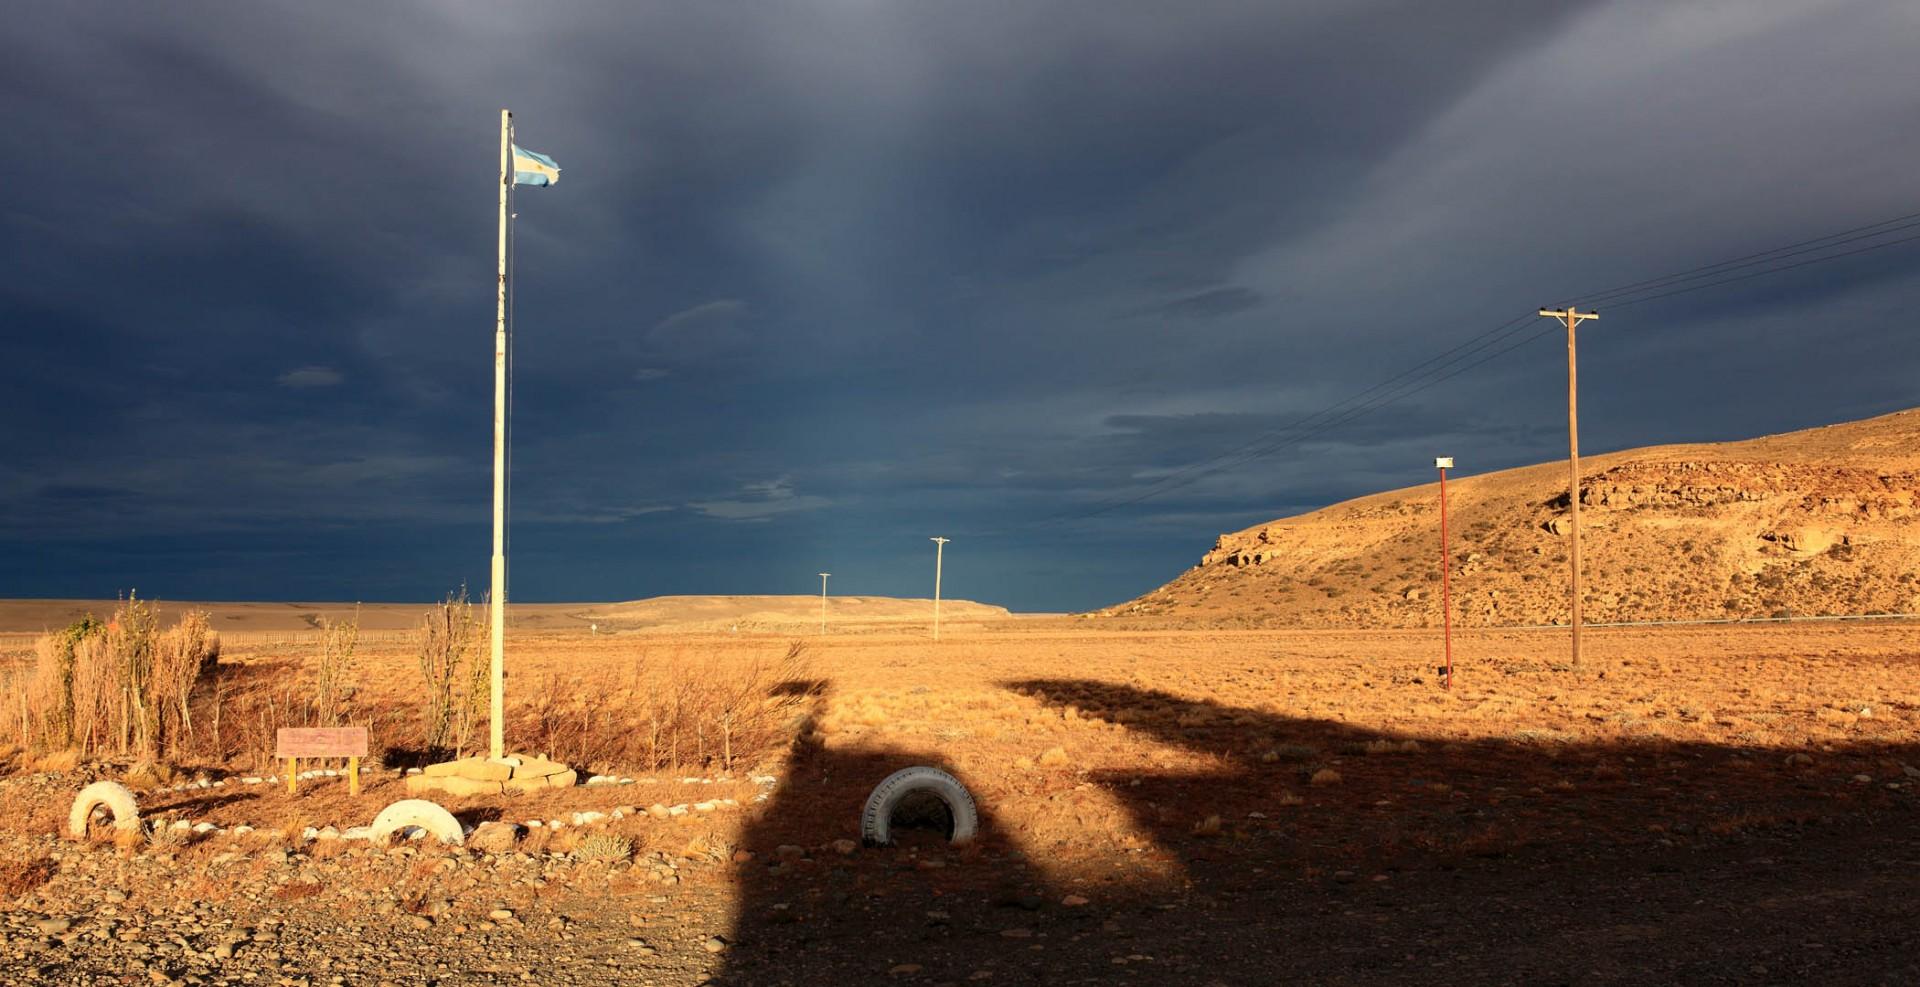 Reportage-Fotograf-in-Paris-Reportage-Fotografie-leuchtendes-patagonien